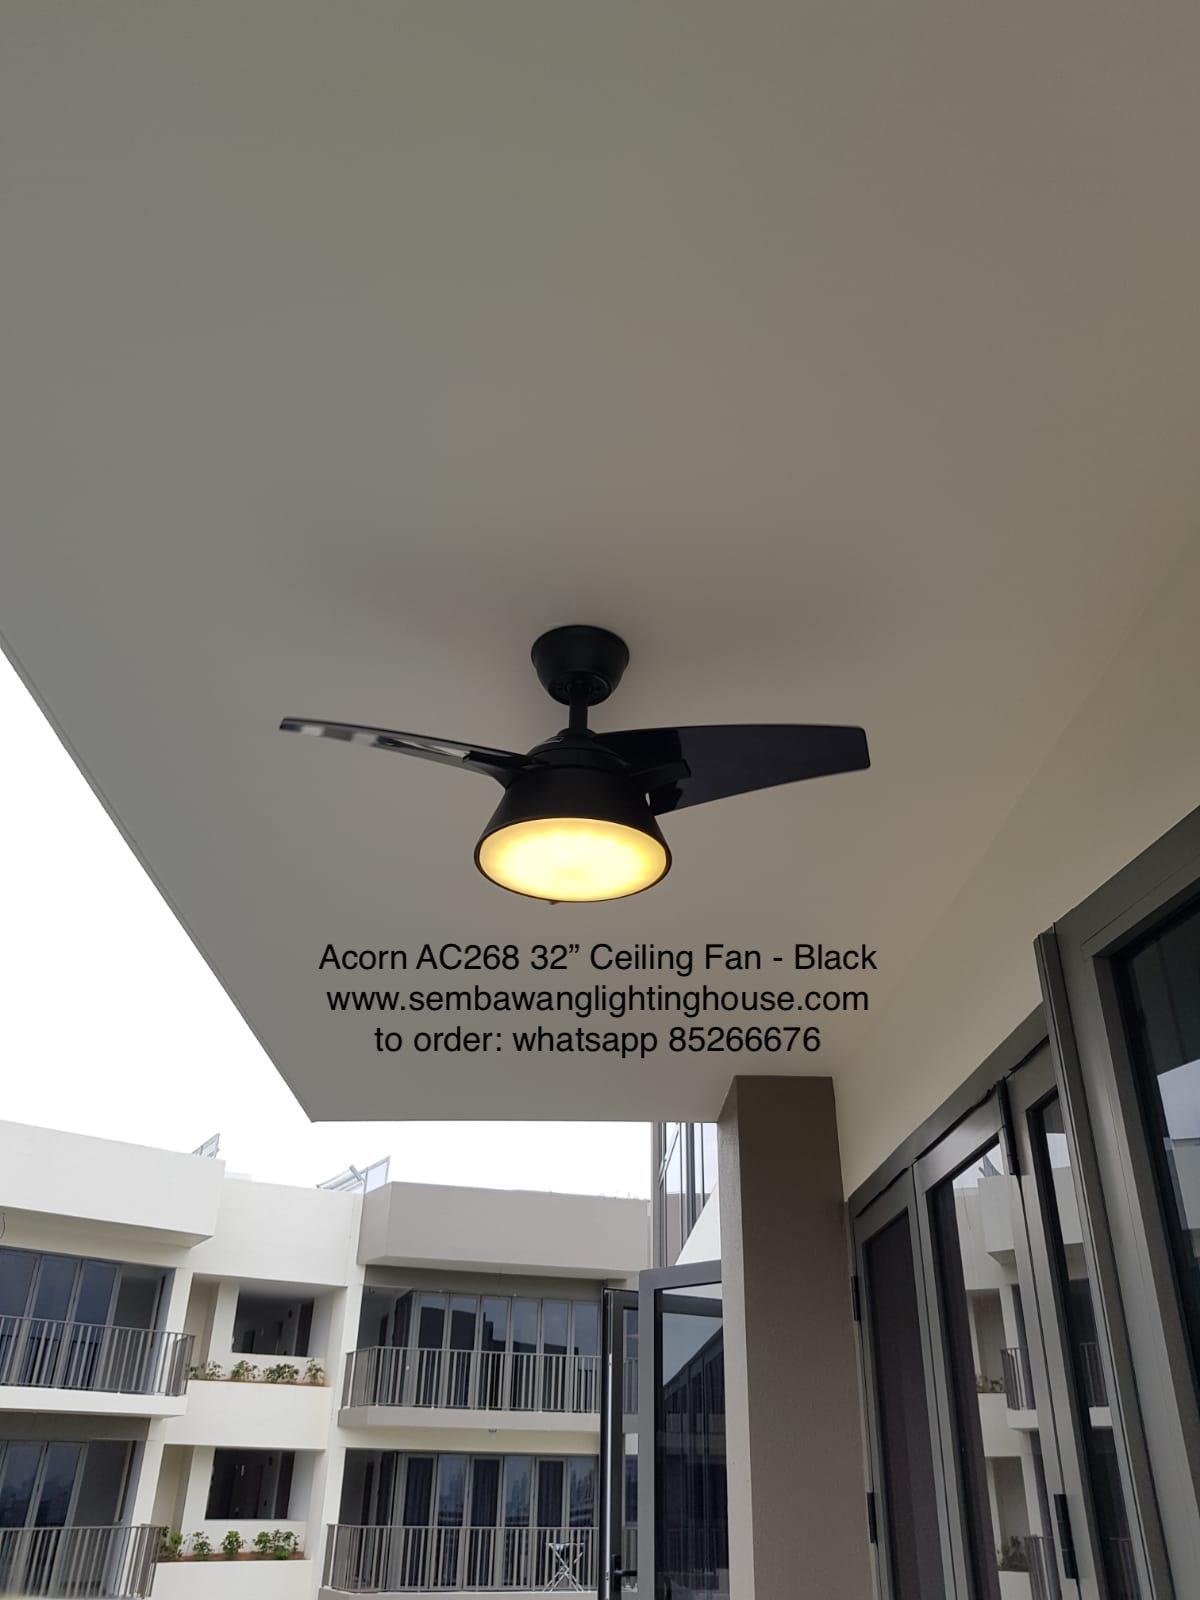 sample01-acorn-ac268-ceiling-fan-black-sembawang-lighting-house.jpg